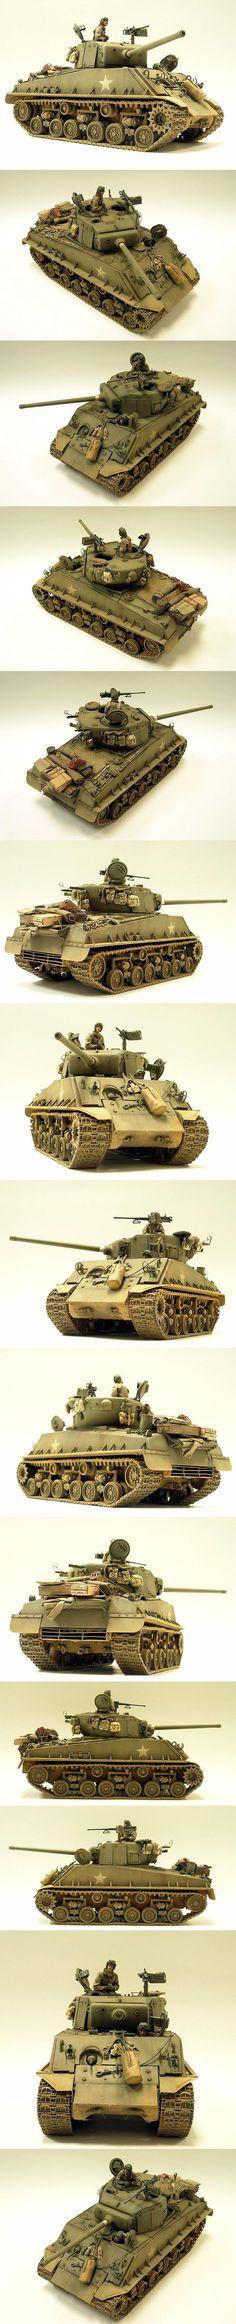 Sherman M4A3E8 (76mm) 1/35 Scale Model: